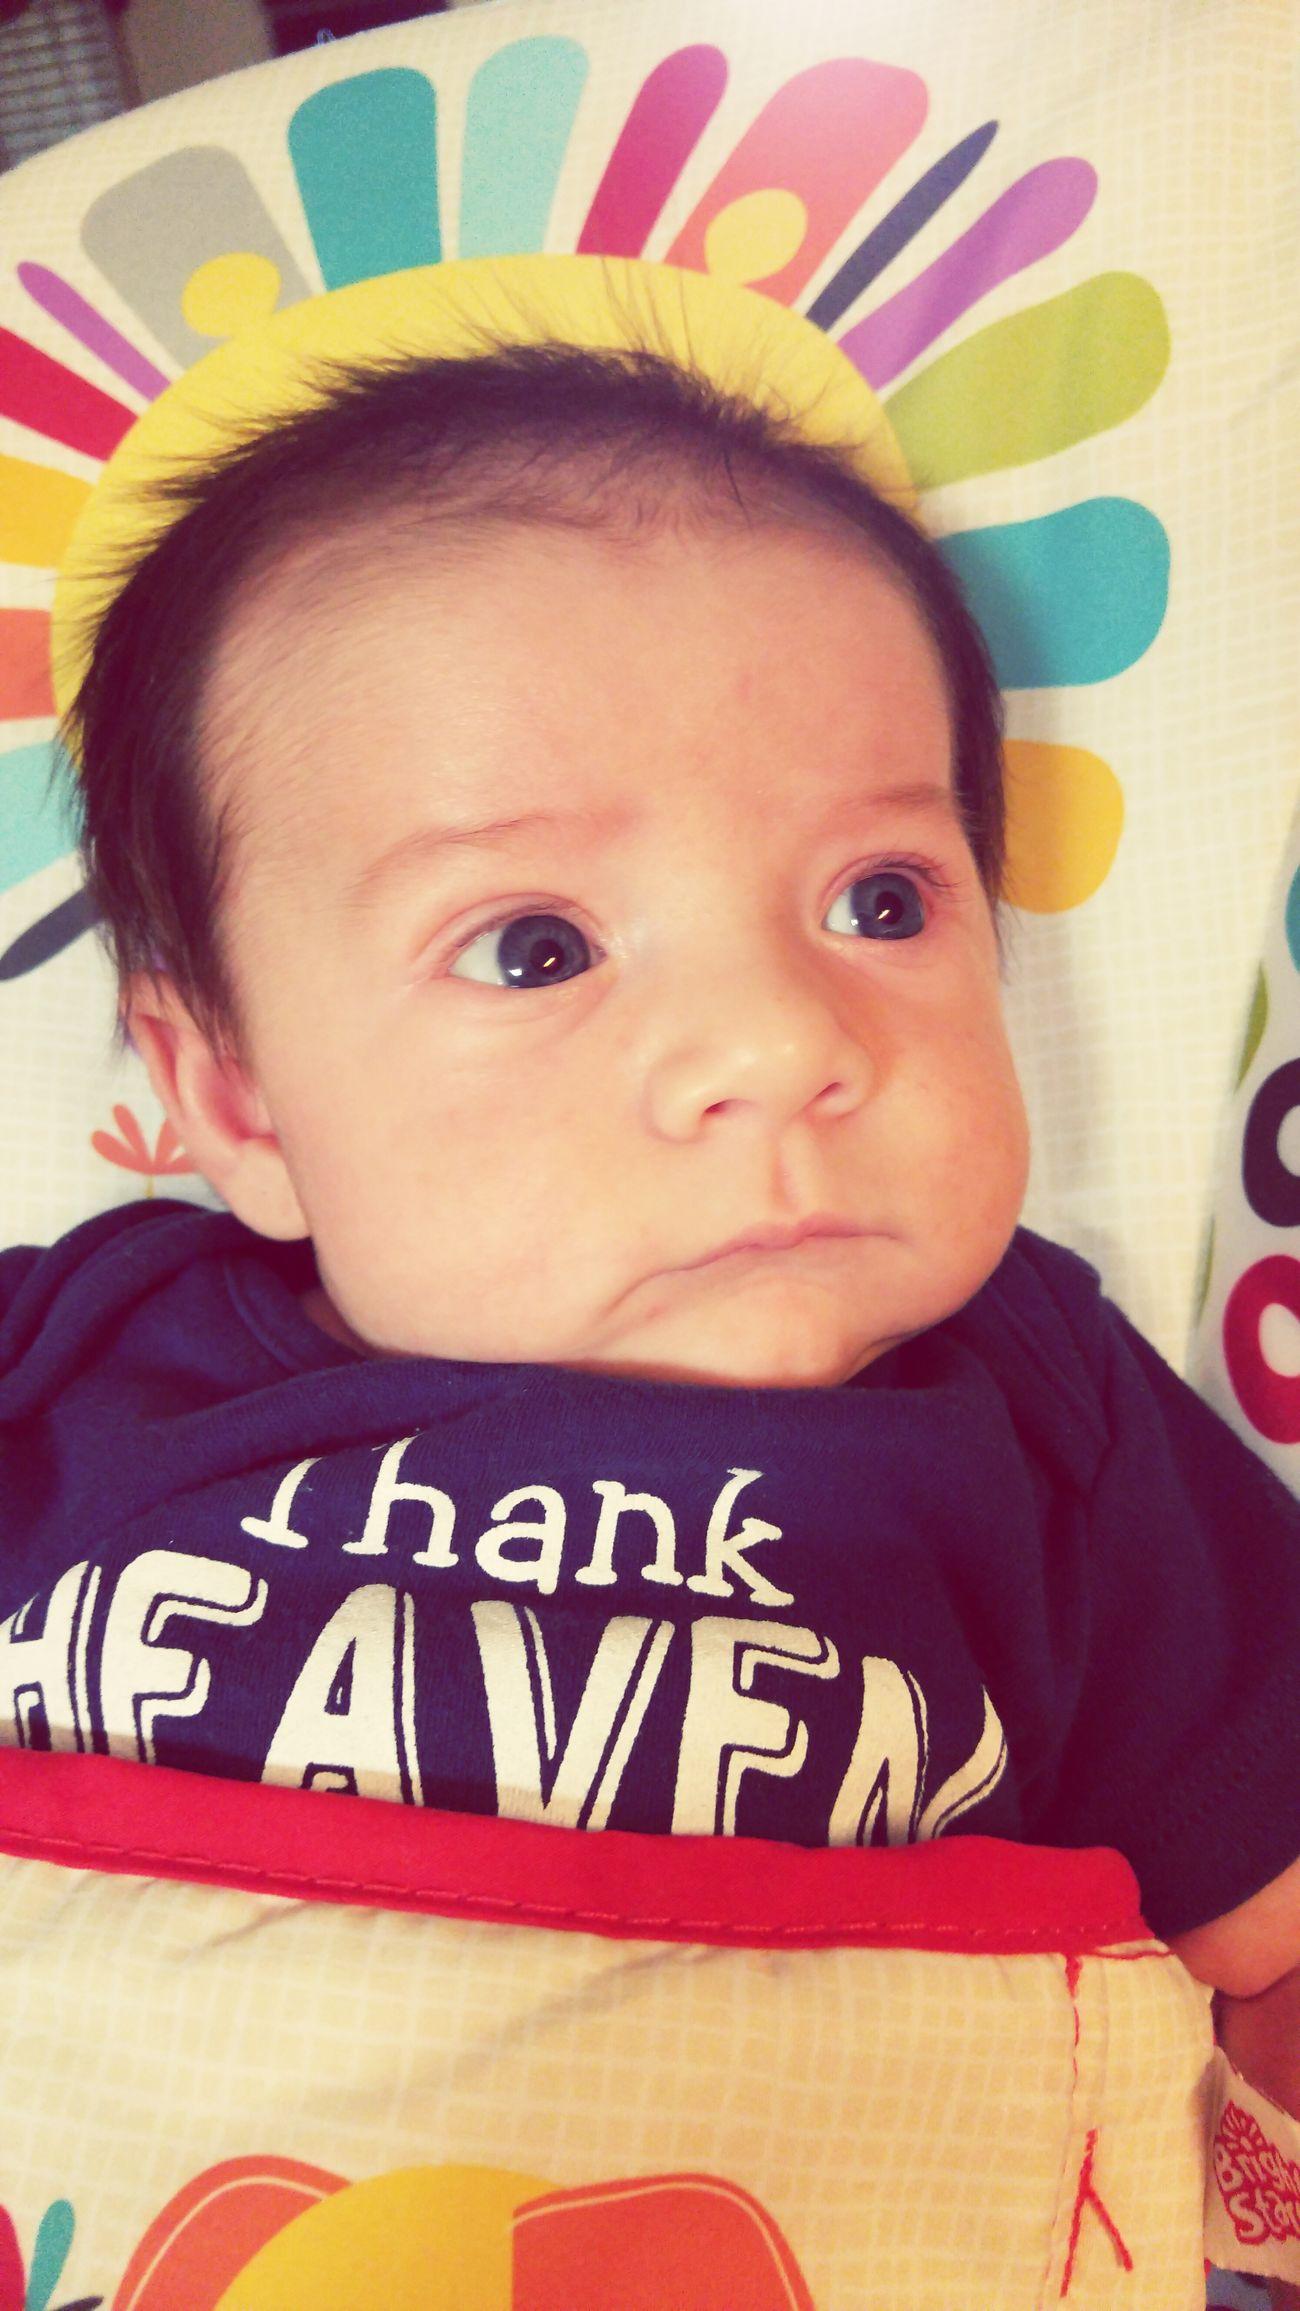 Blue eyed baby boy